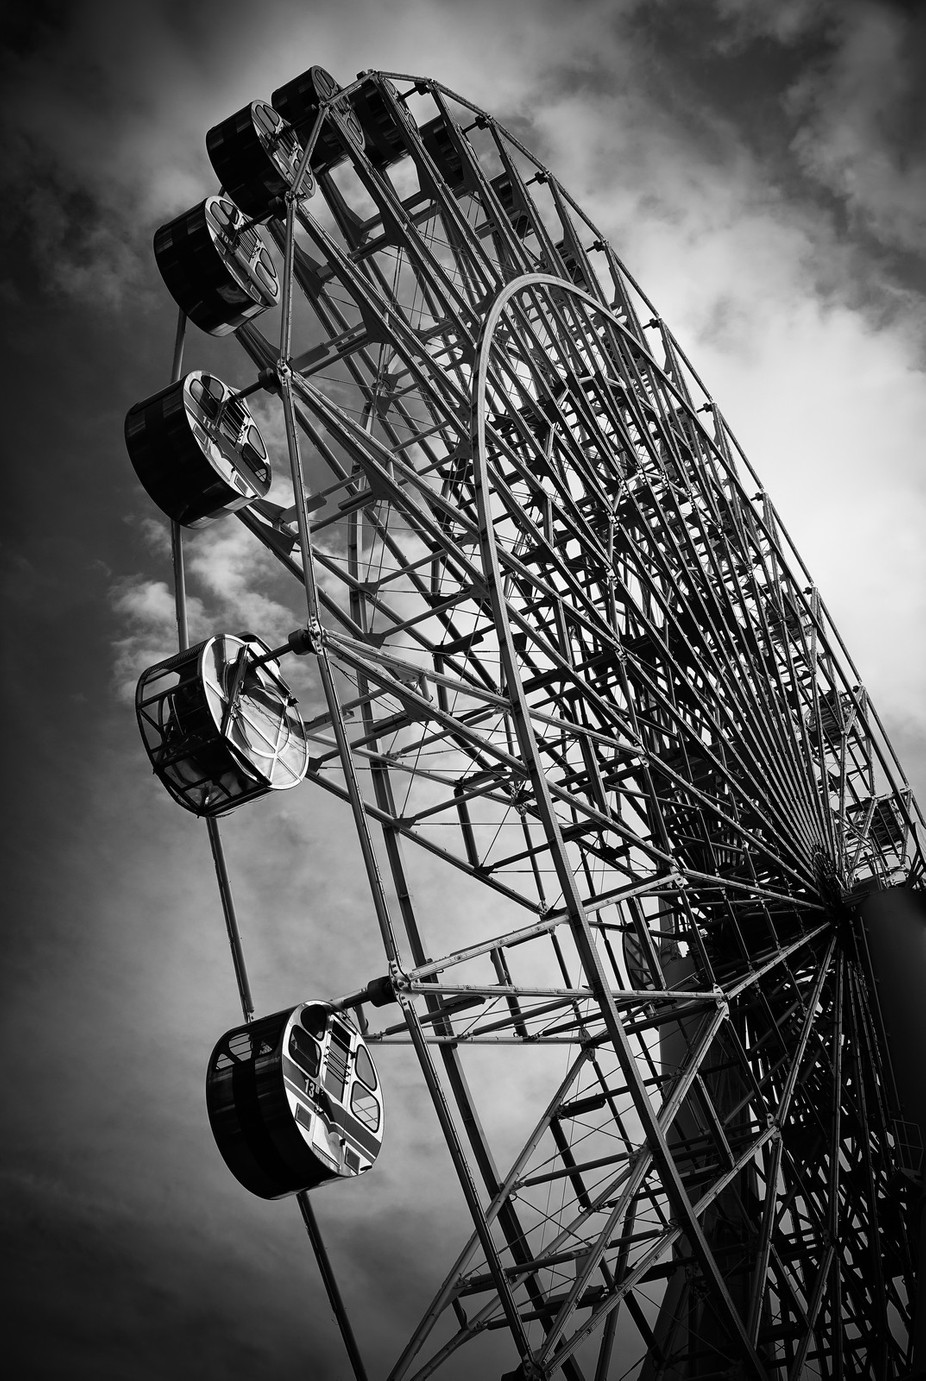 Ferris Wheel, FujiQ Highlands by davidscottrobson - Large Photo Contest